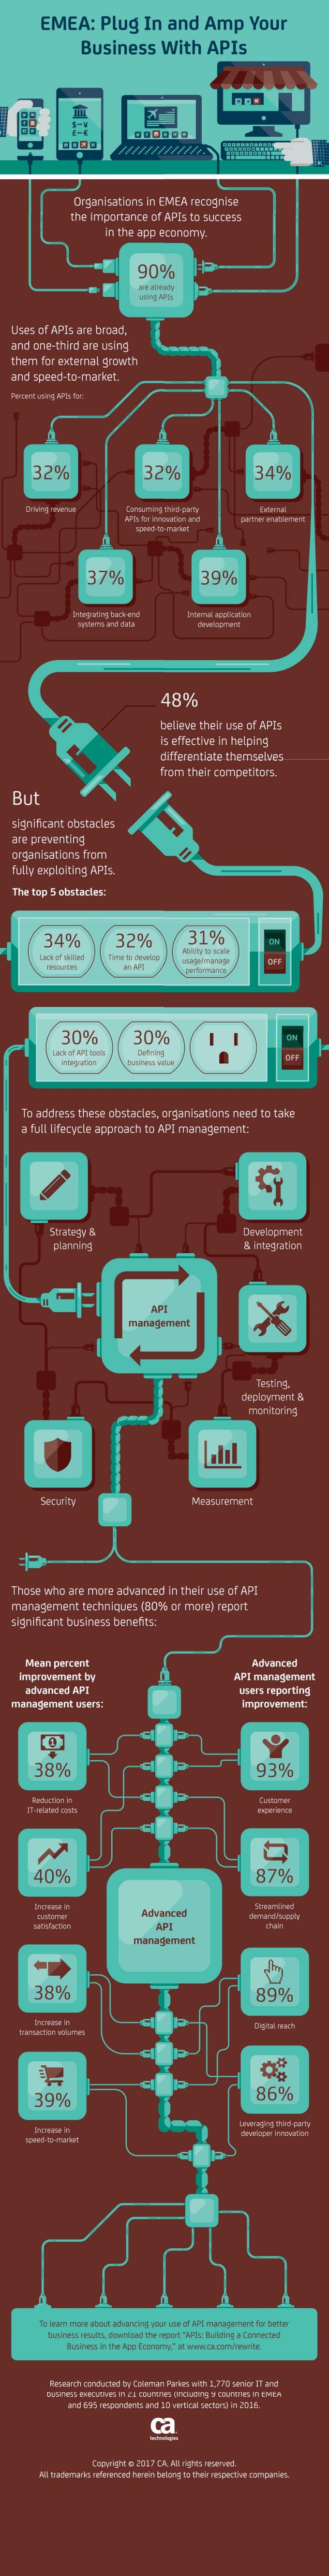 EMEA_API Infographic